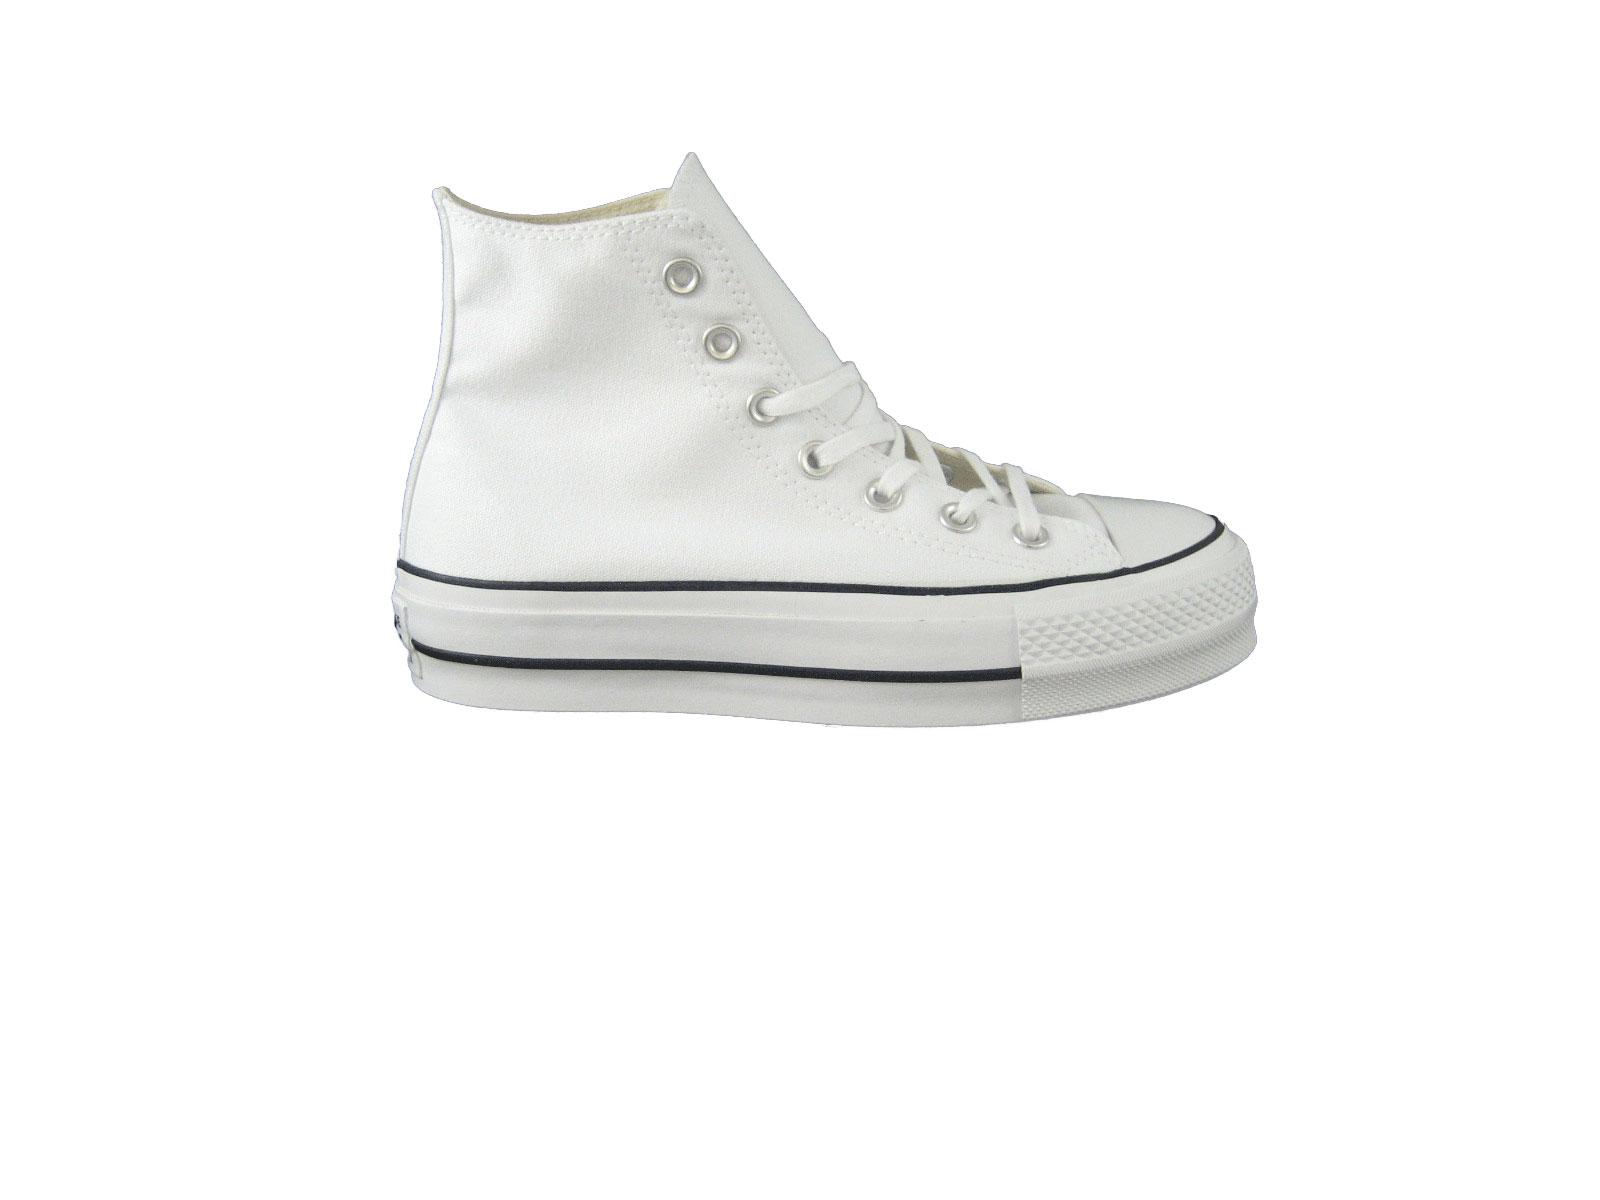 E19 Converse 560846ctessuto White.jpg